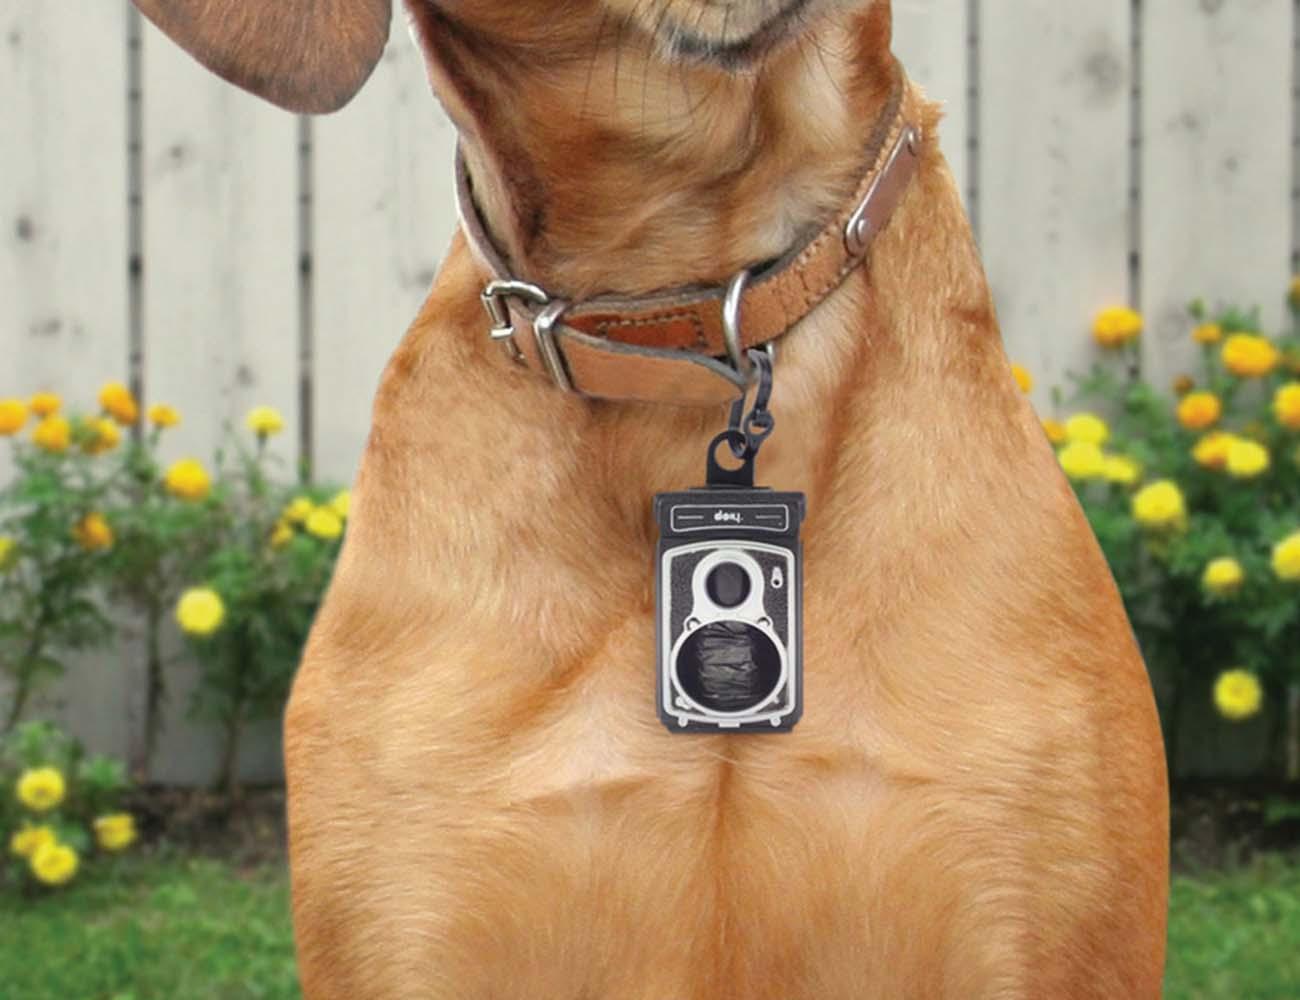 Rolldog+Pet+Bag+Dispenser